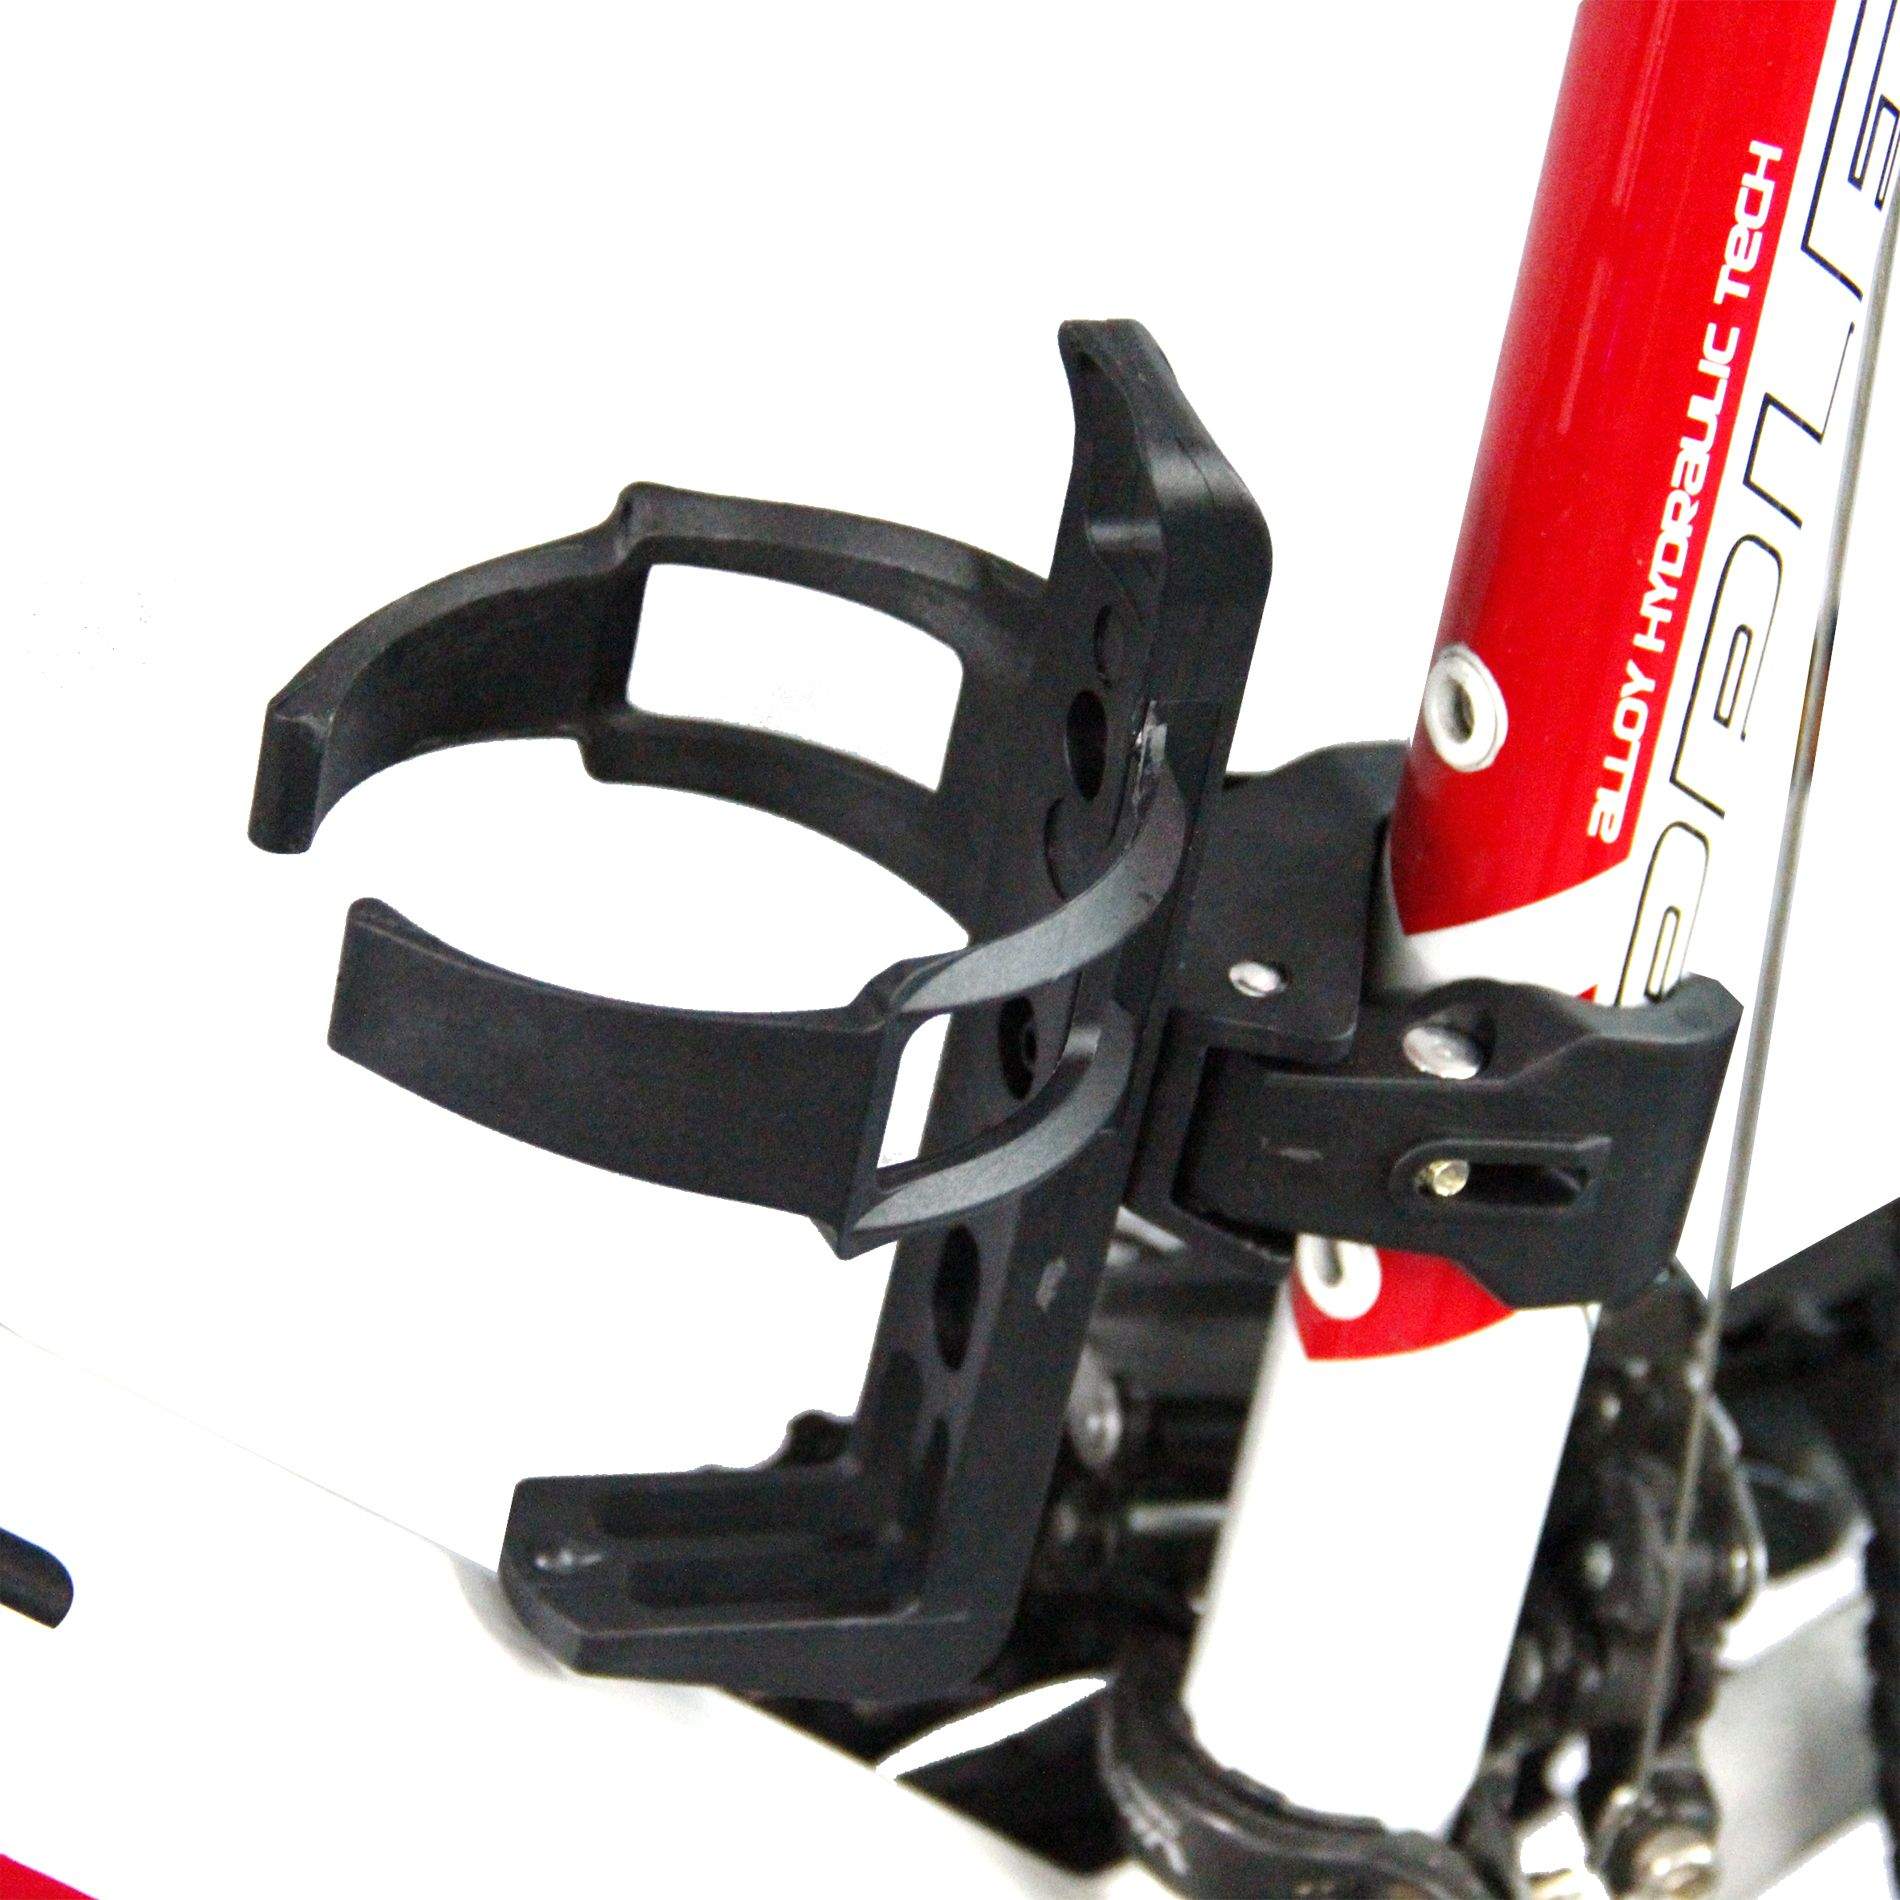 Quick Release Bike Handlebar Mount Water Bottle Cage Holder Rack